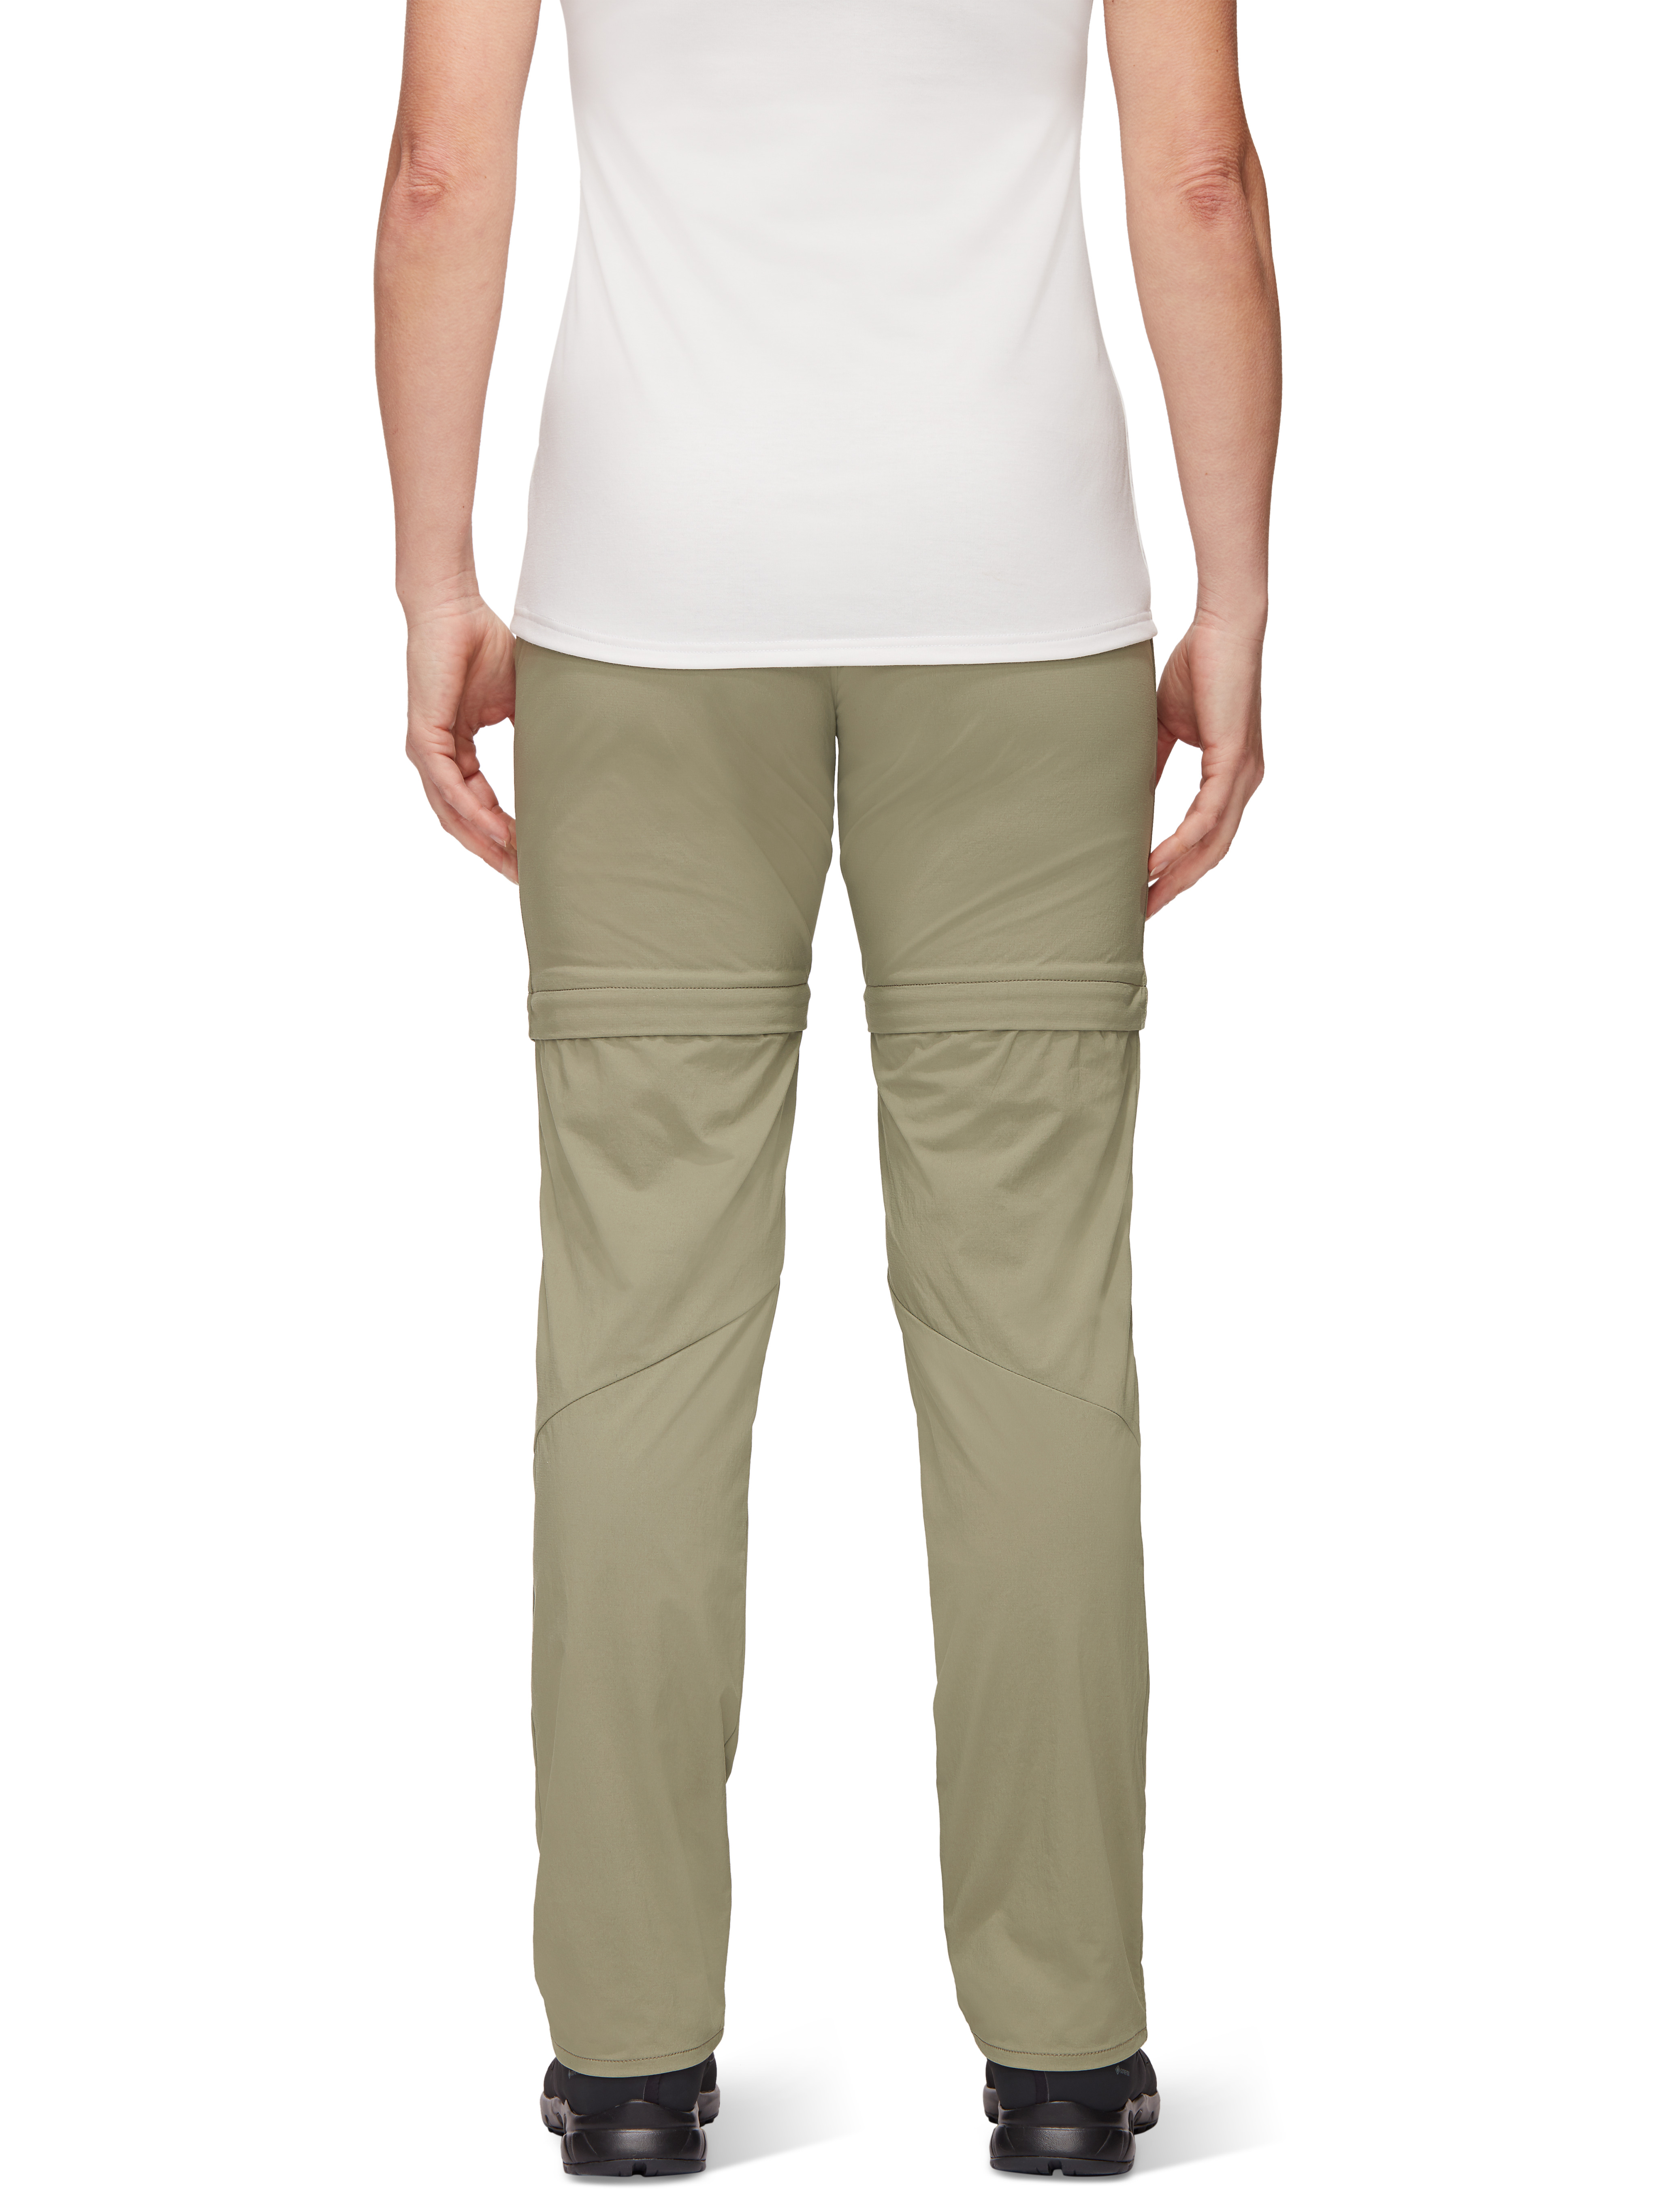 Hiking Zip Off Pants Women product image